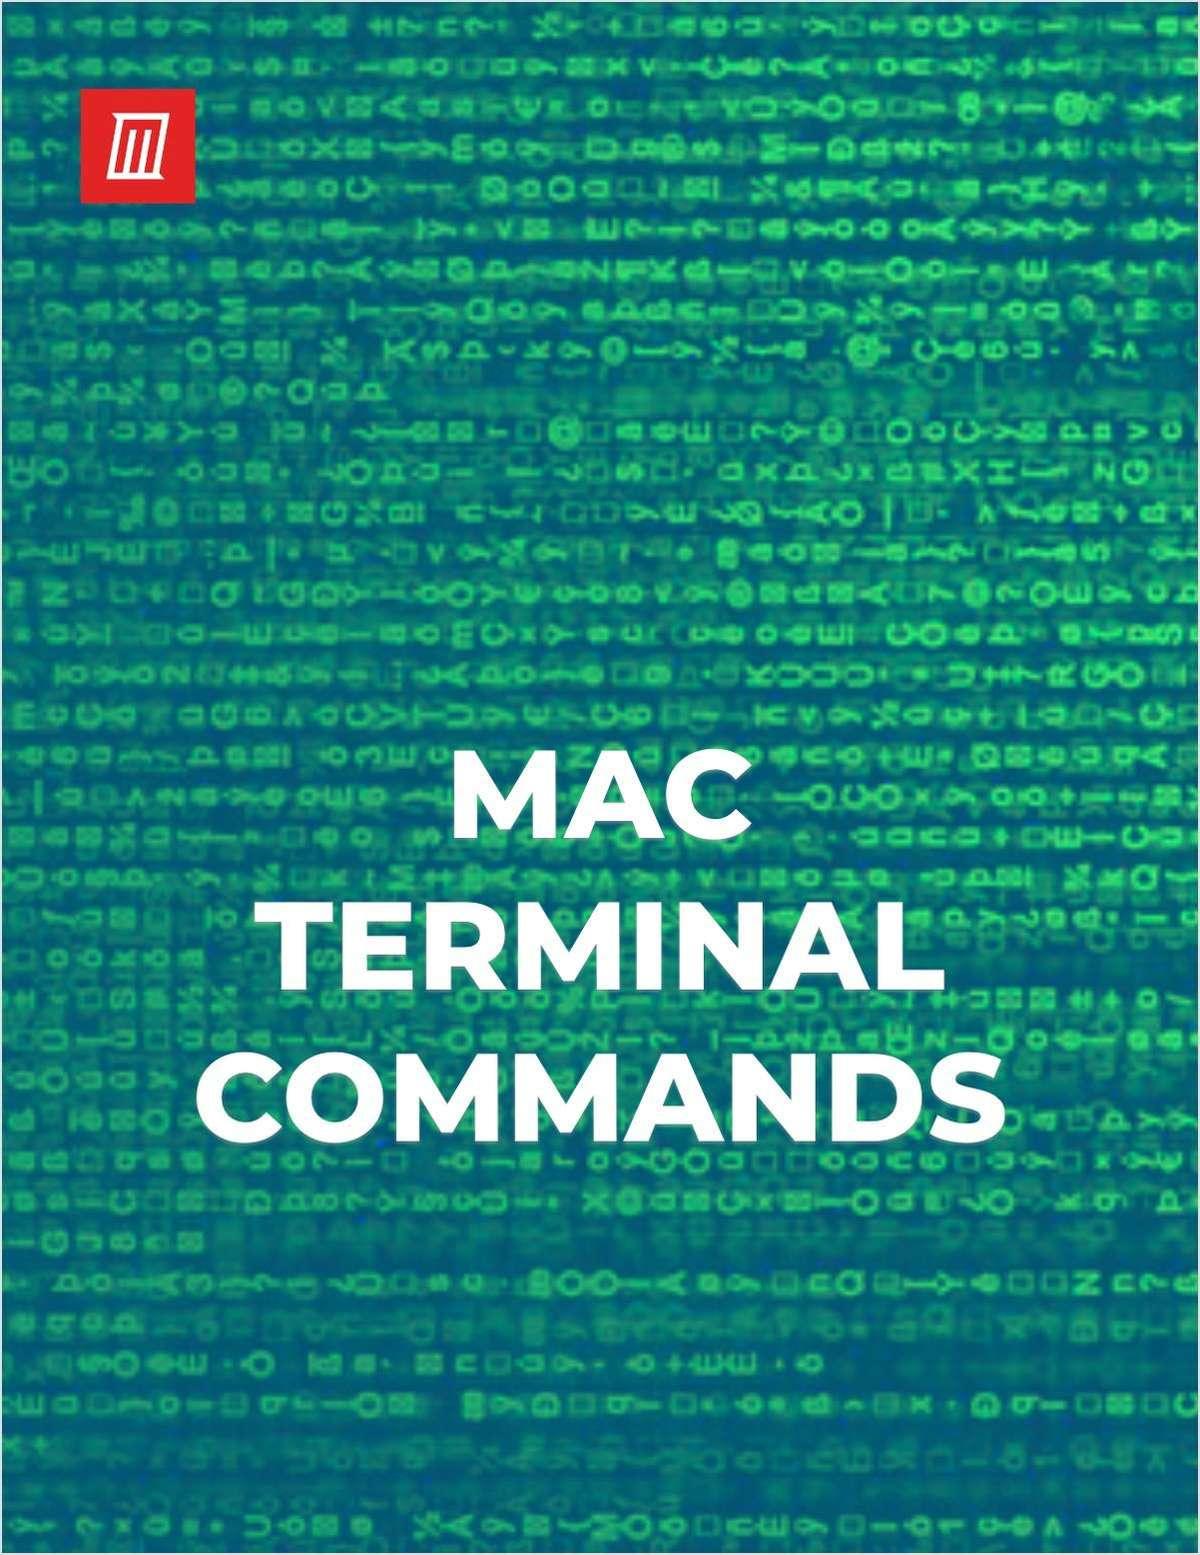 Mac Terminal Commands Cheat Sheet